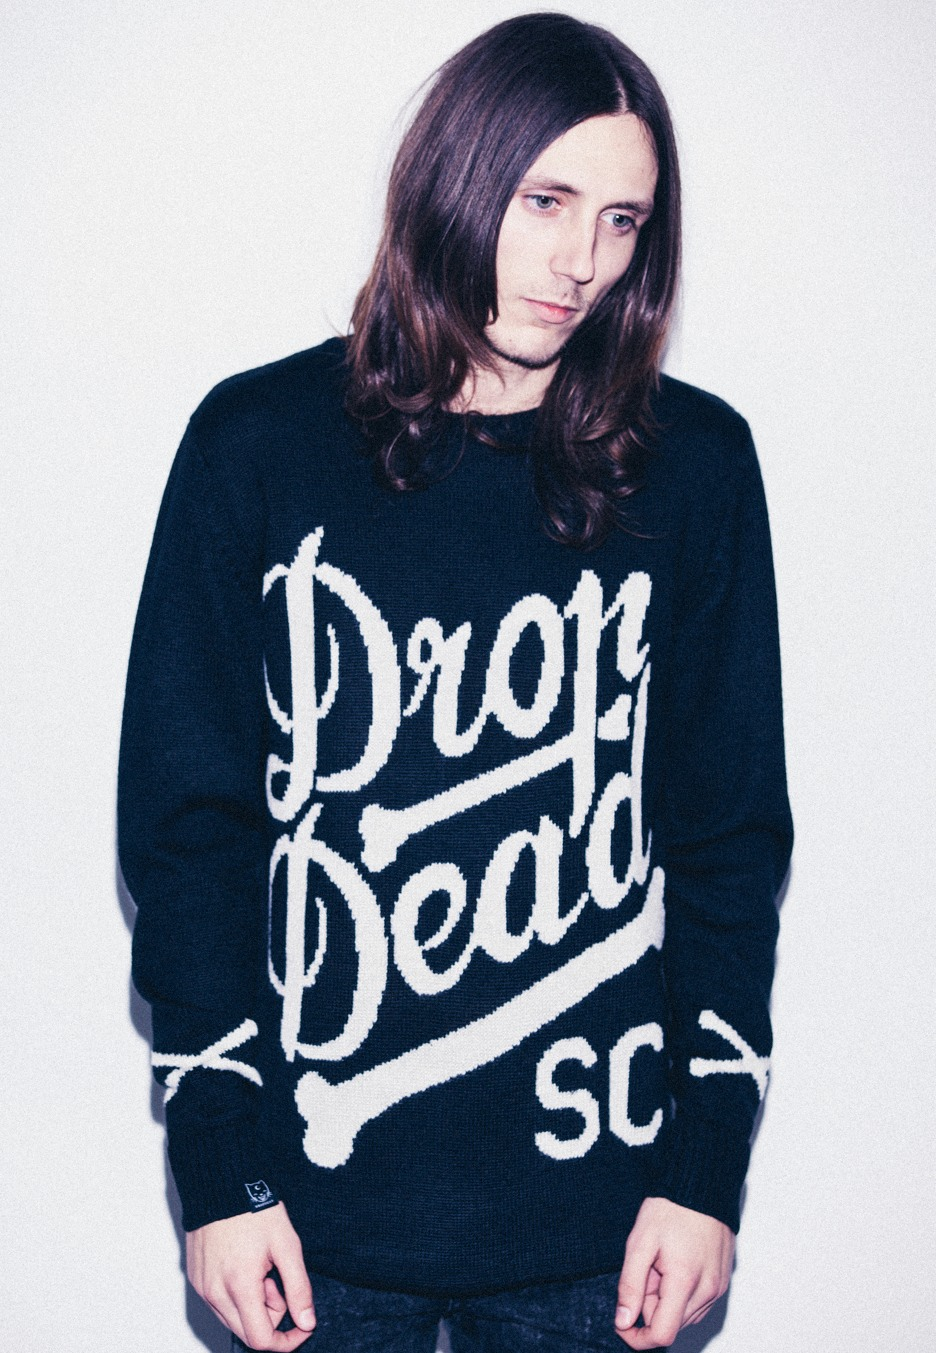 Drop Dead - Boner - Pullover - Impericon.com Worldwide